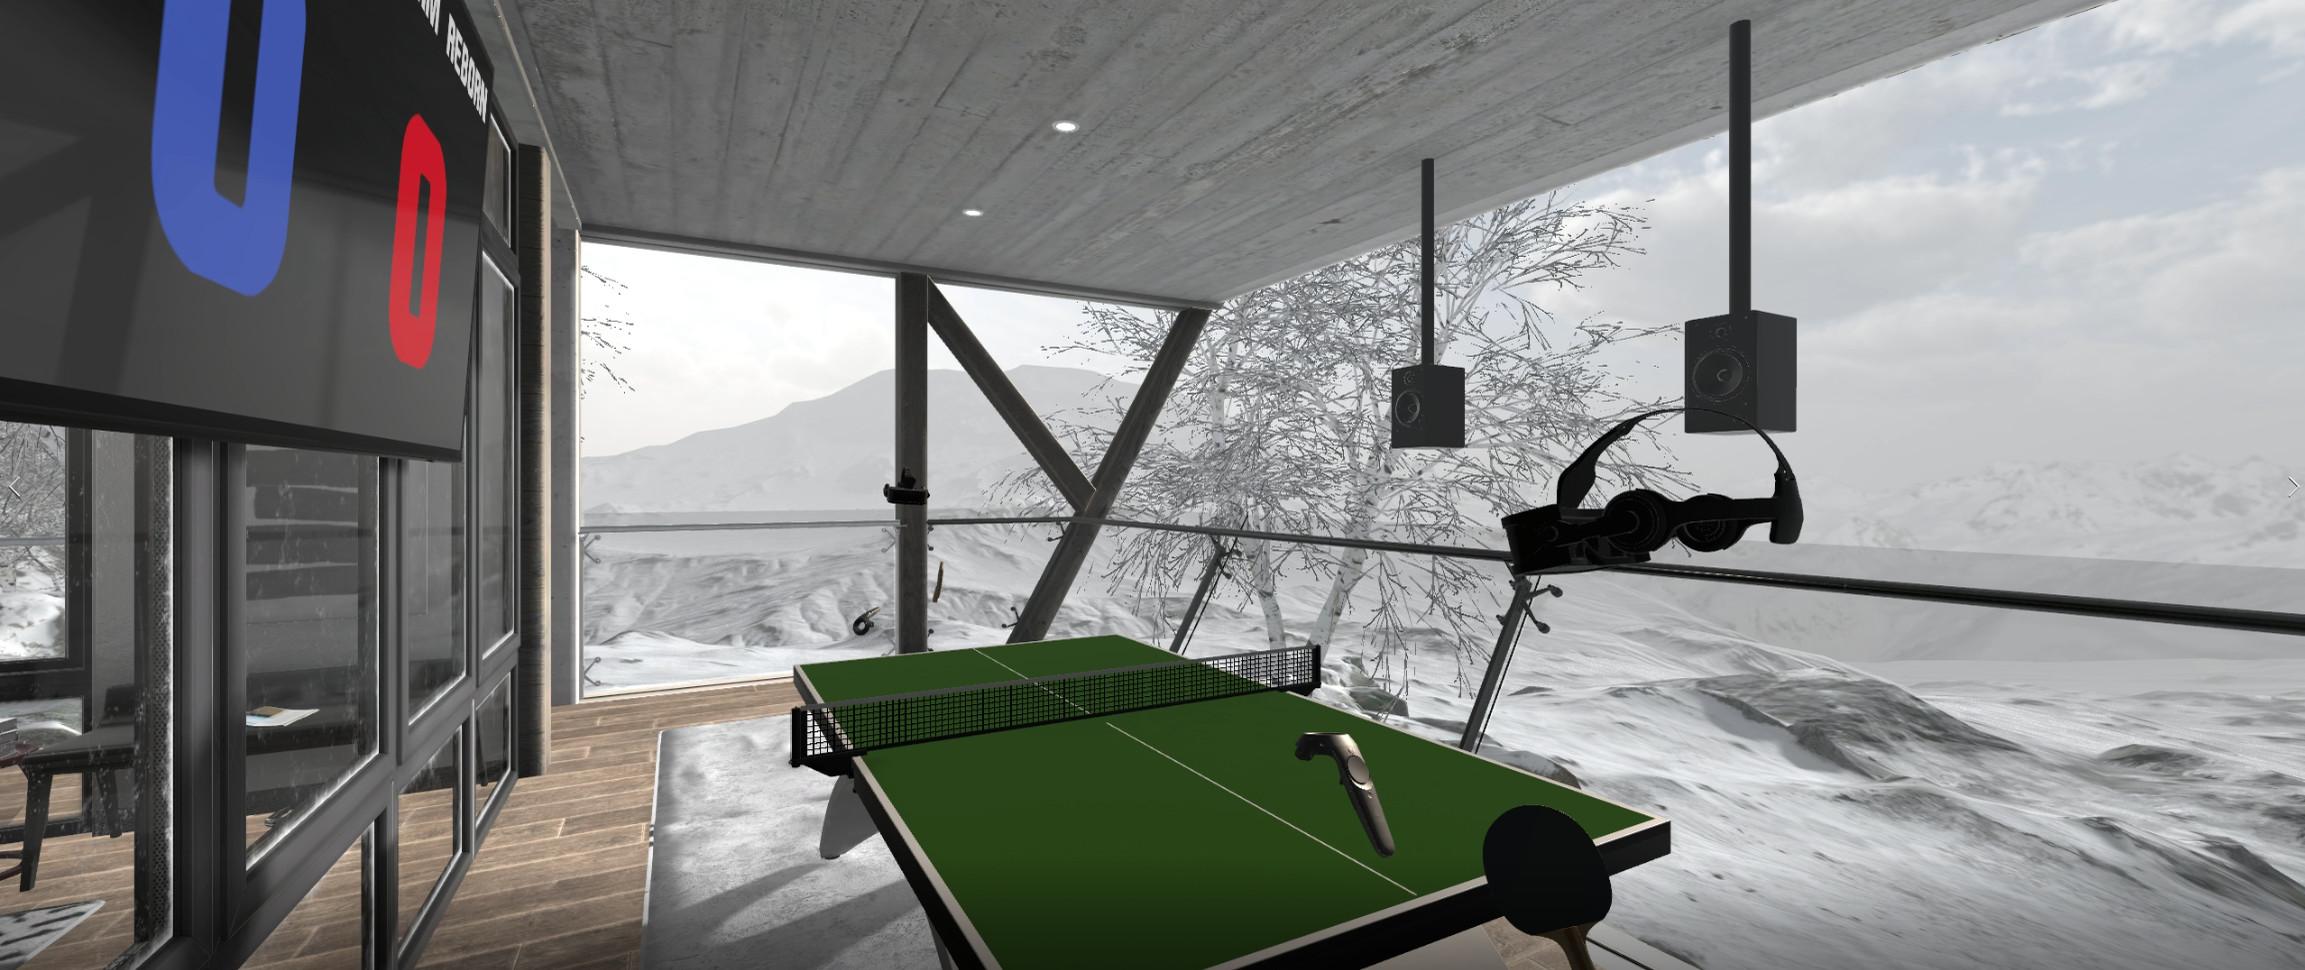 Eleven-Table-Tennis-VR-Oculus-Rift-Oculus-Store-Steam